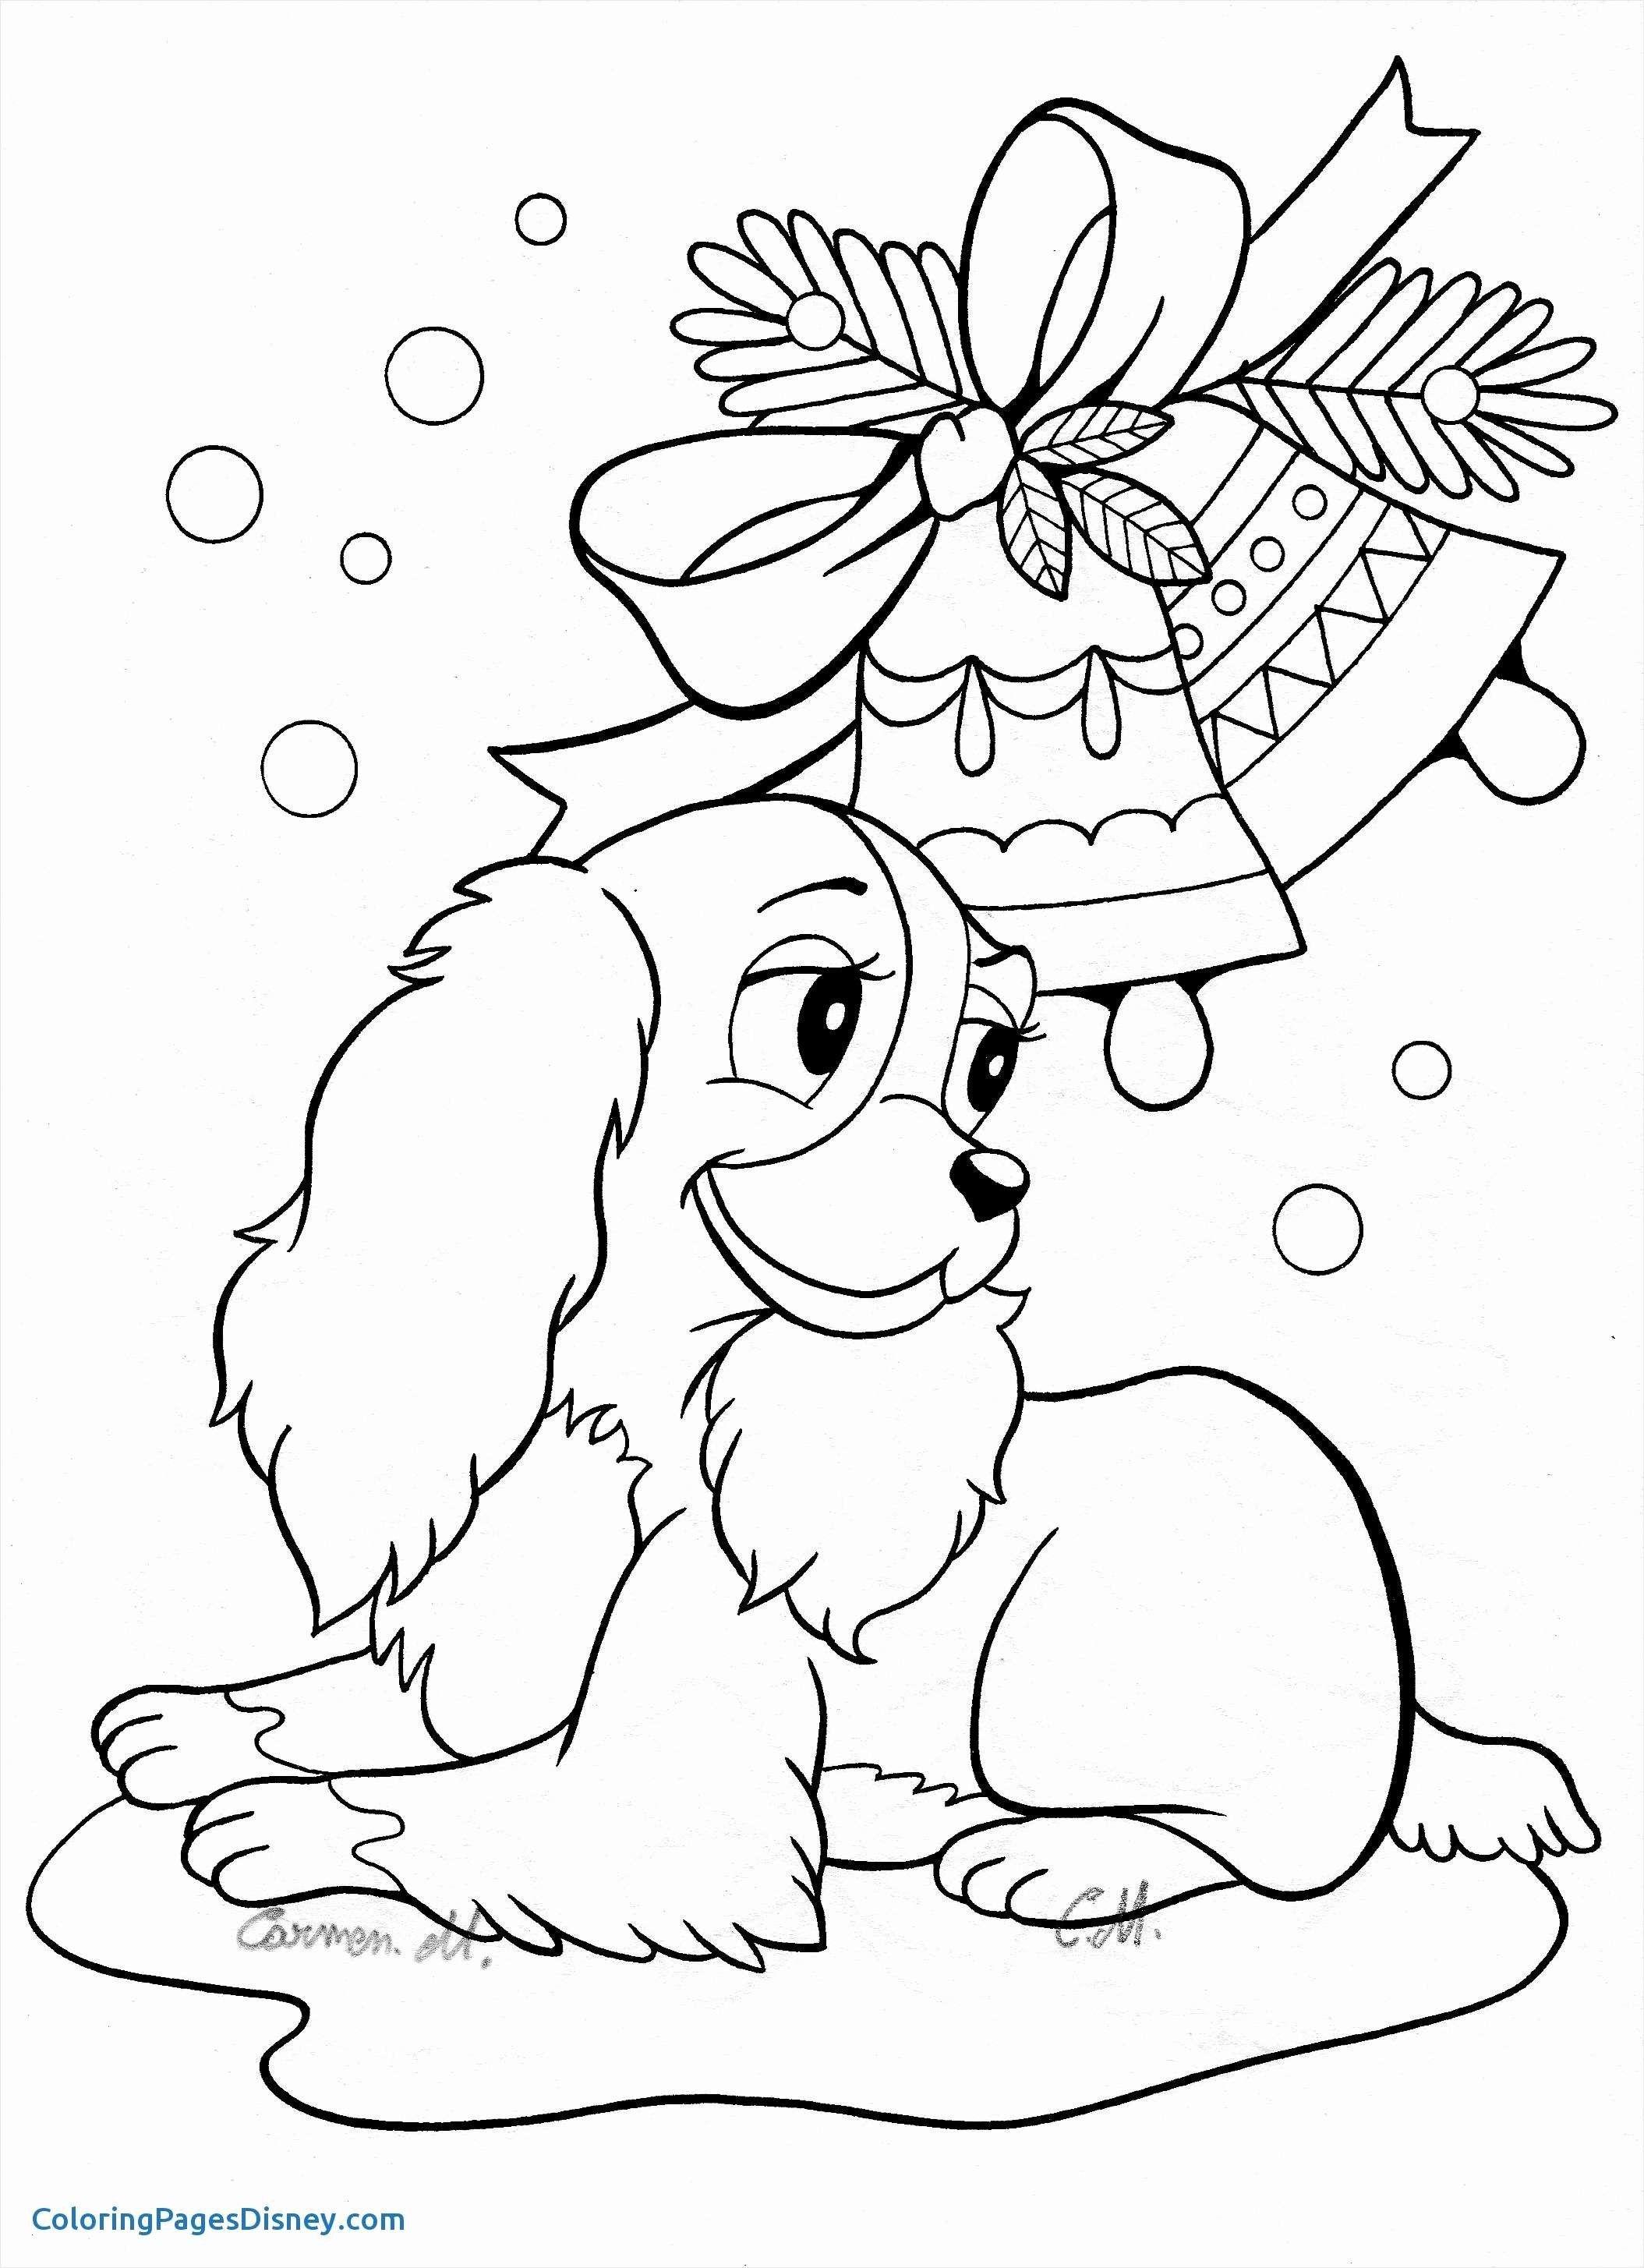 Princess Ariel Coloring Pages Free